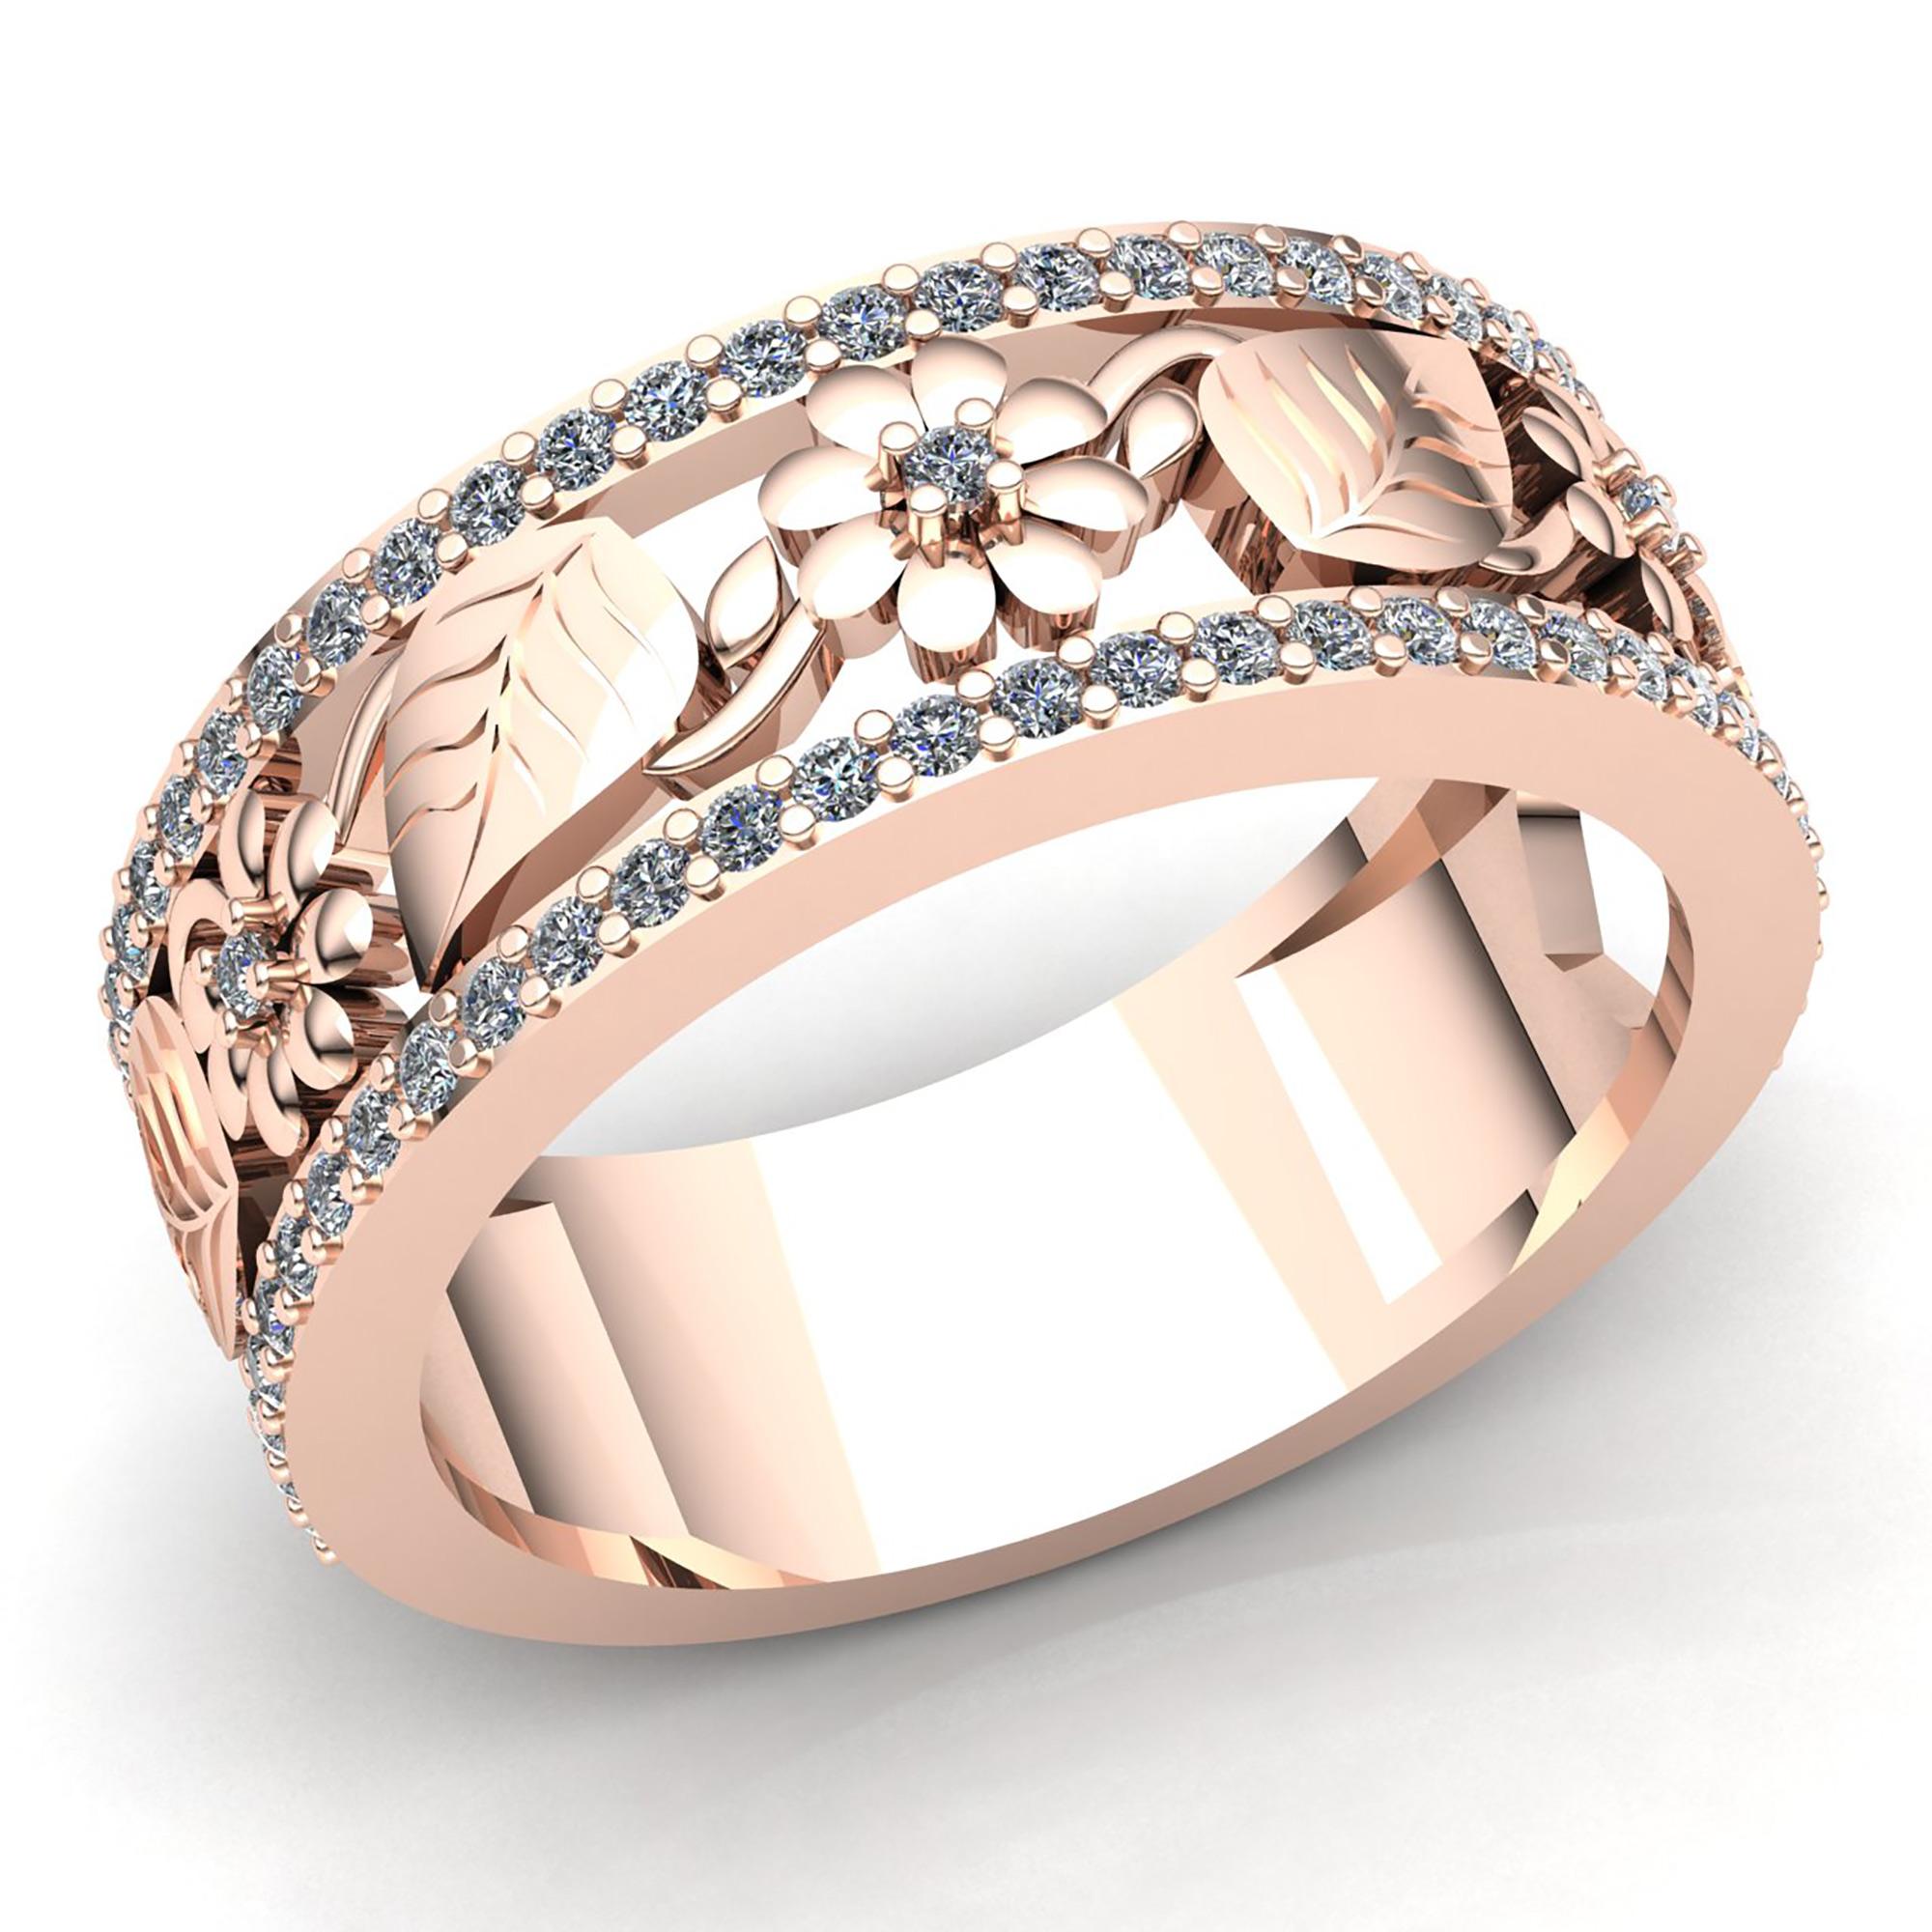 Wedding Flowers And Rings: Natural 5ct Round Cut Diamond Ladies Bridal Flower Wedding